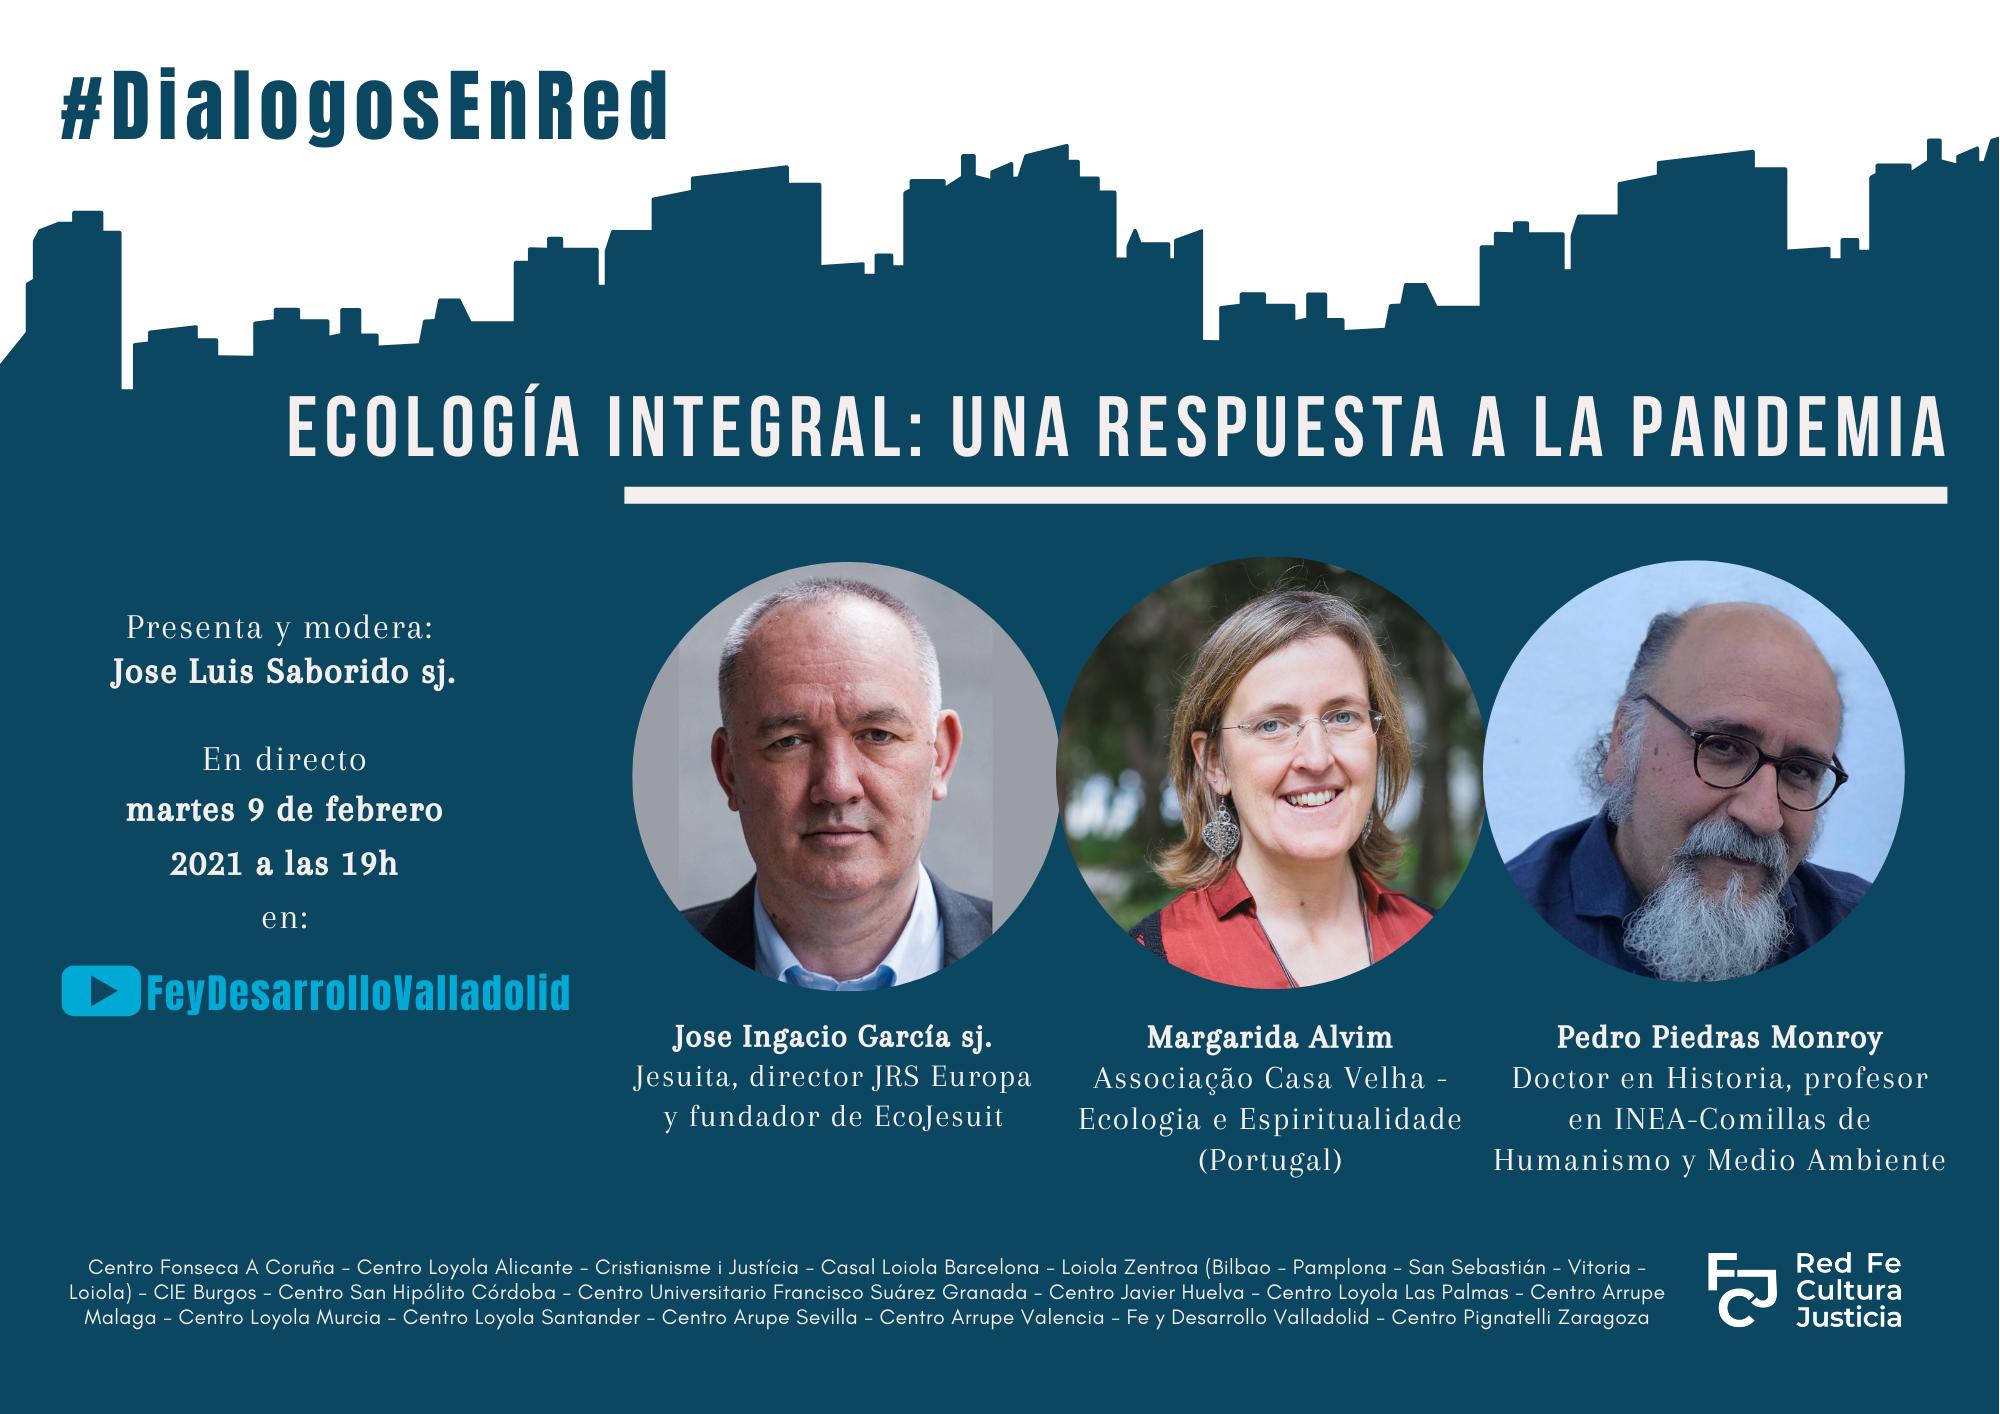 Ecologia Integral una respuesta a la pandemia - DialogosEnRed - 9 febrero